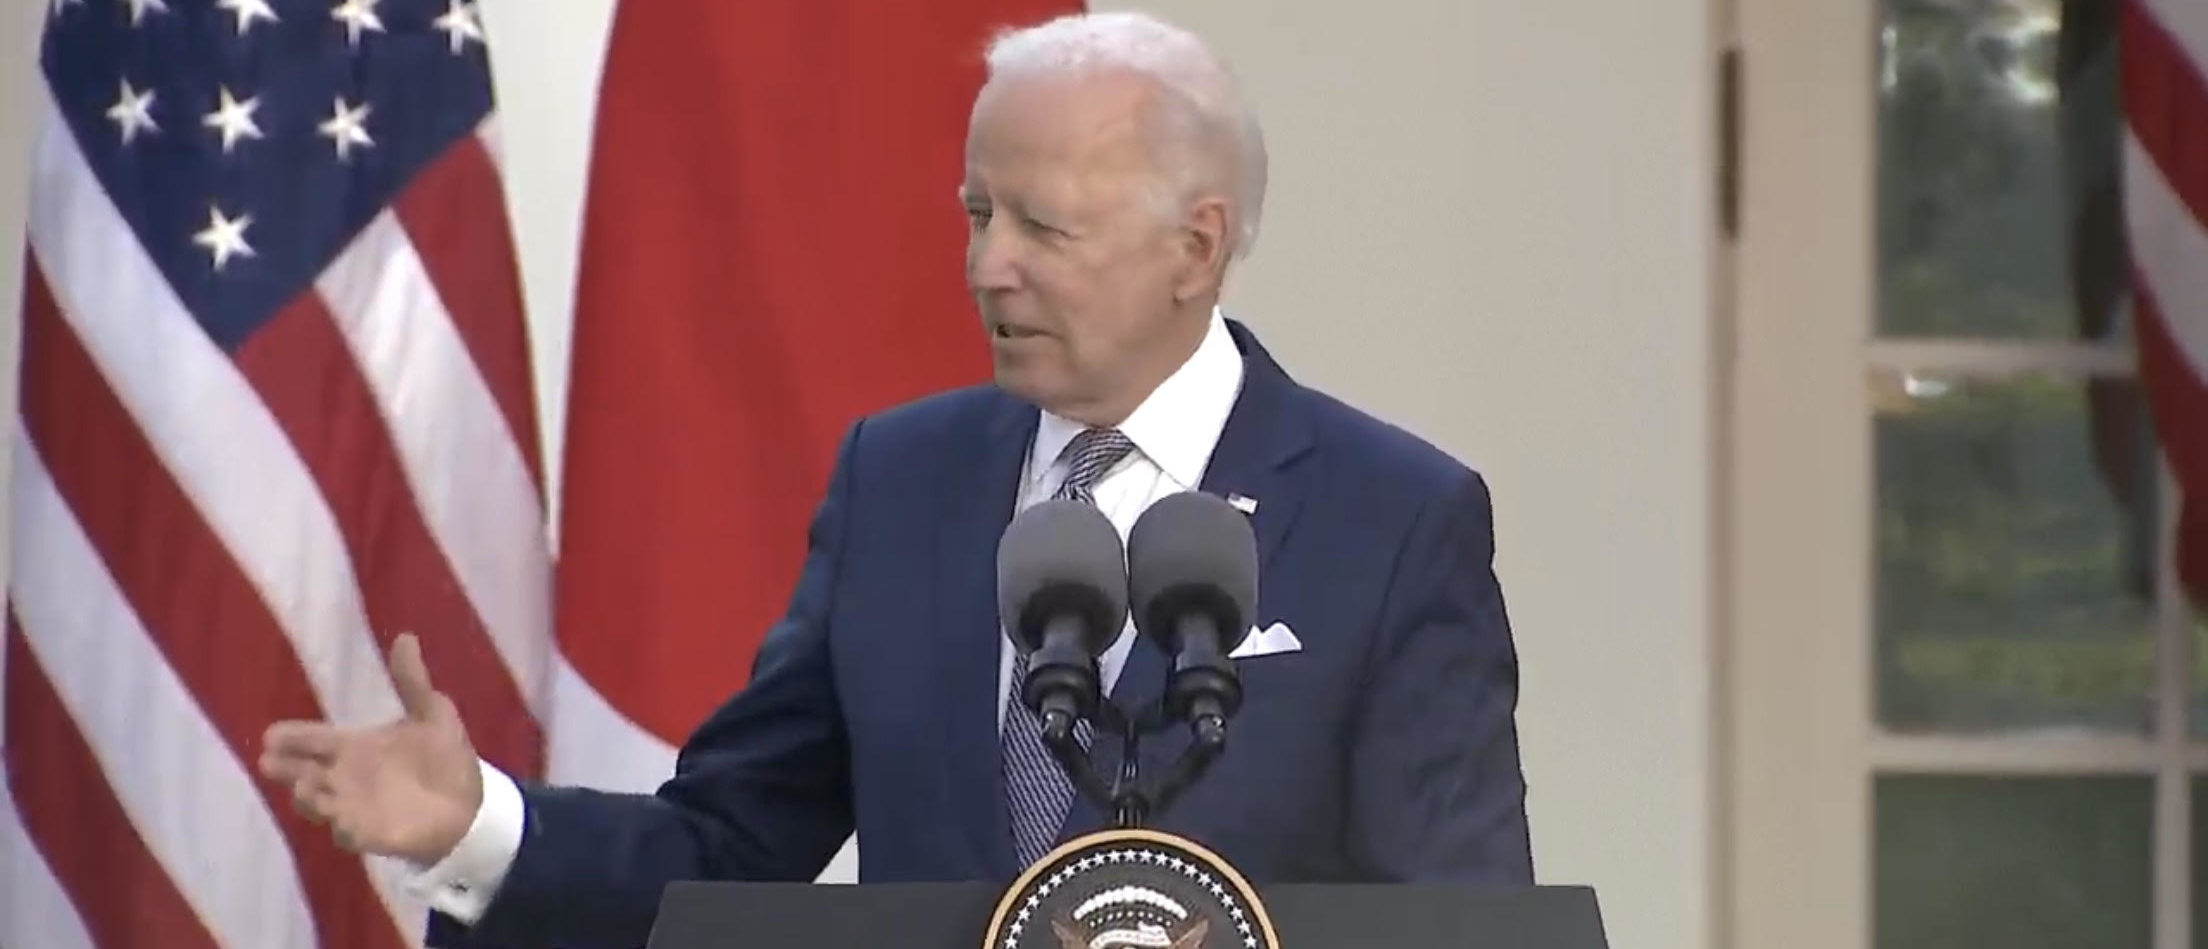 Biden, Japan's Yoshihide Condemn 'Increase In Anti-Asian Discrimination' In US